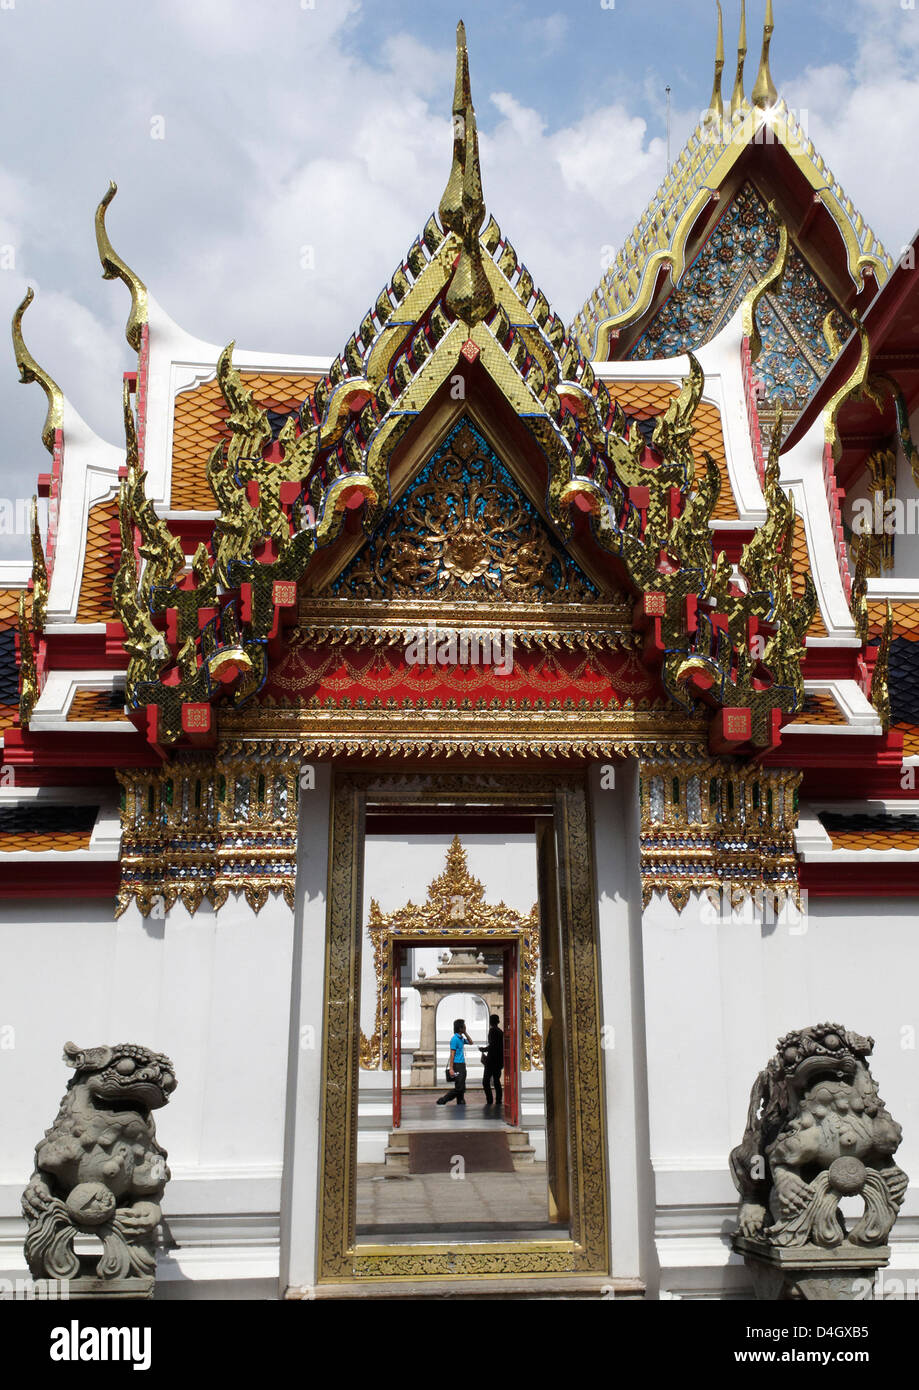 Chedi Phra Rabieng Rai cerca del claustro. Wat Phra Chetuphon, (Wat Po), Bangkok (Tailandia), del Sudeste de Asia Imagen De Stock